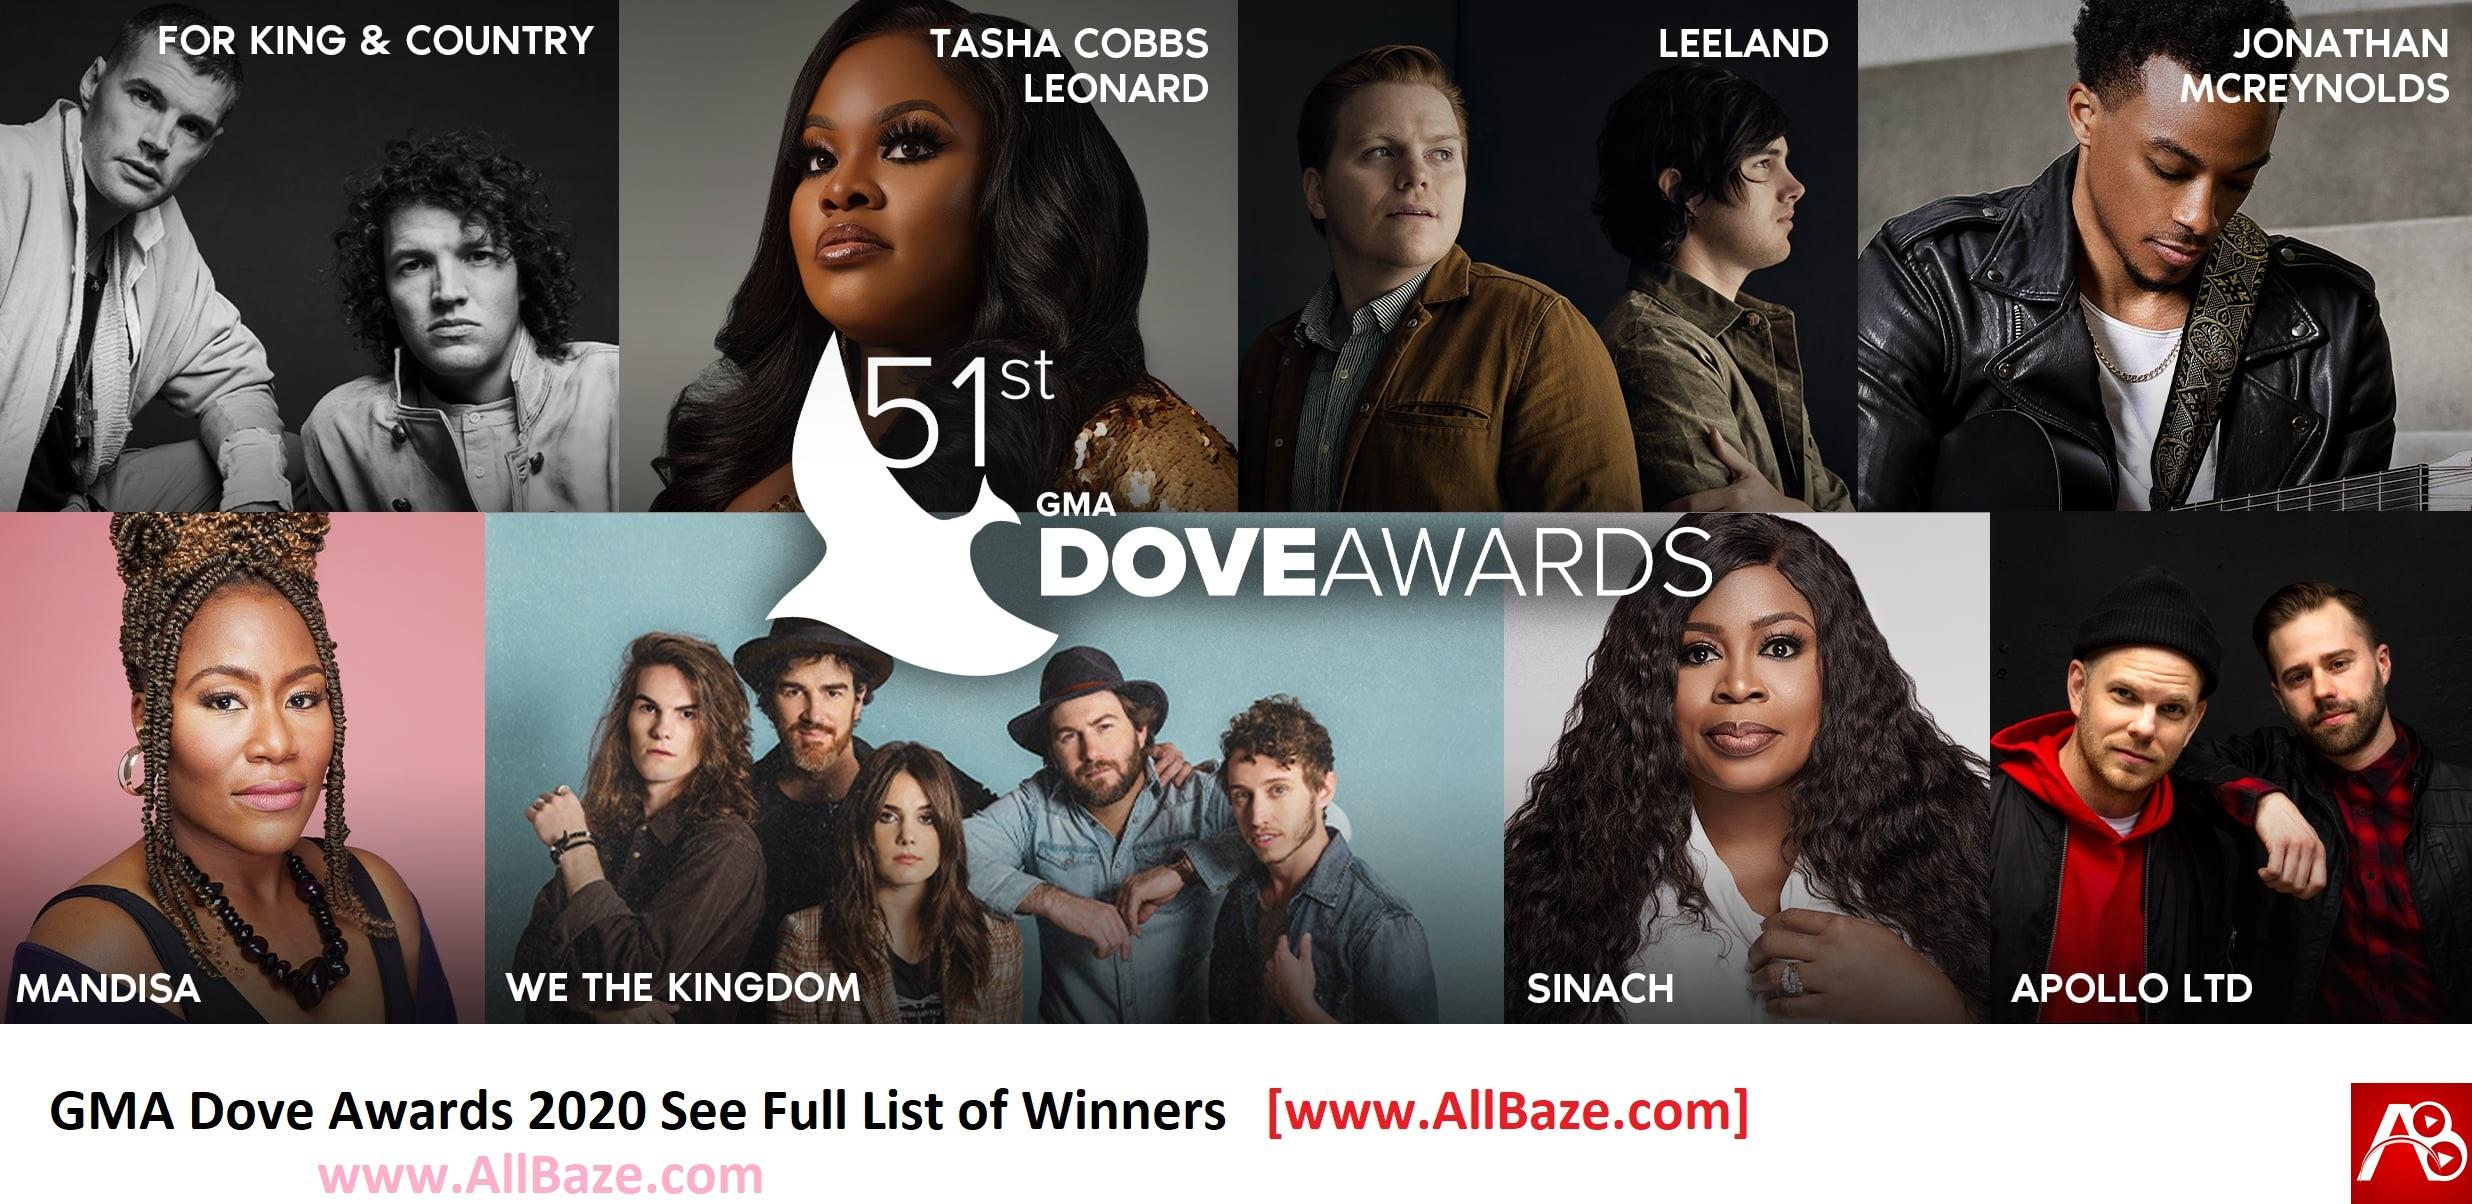 GMA Dove Awards 2020 Winners